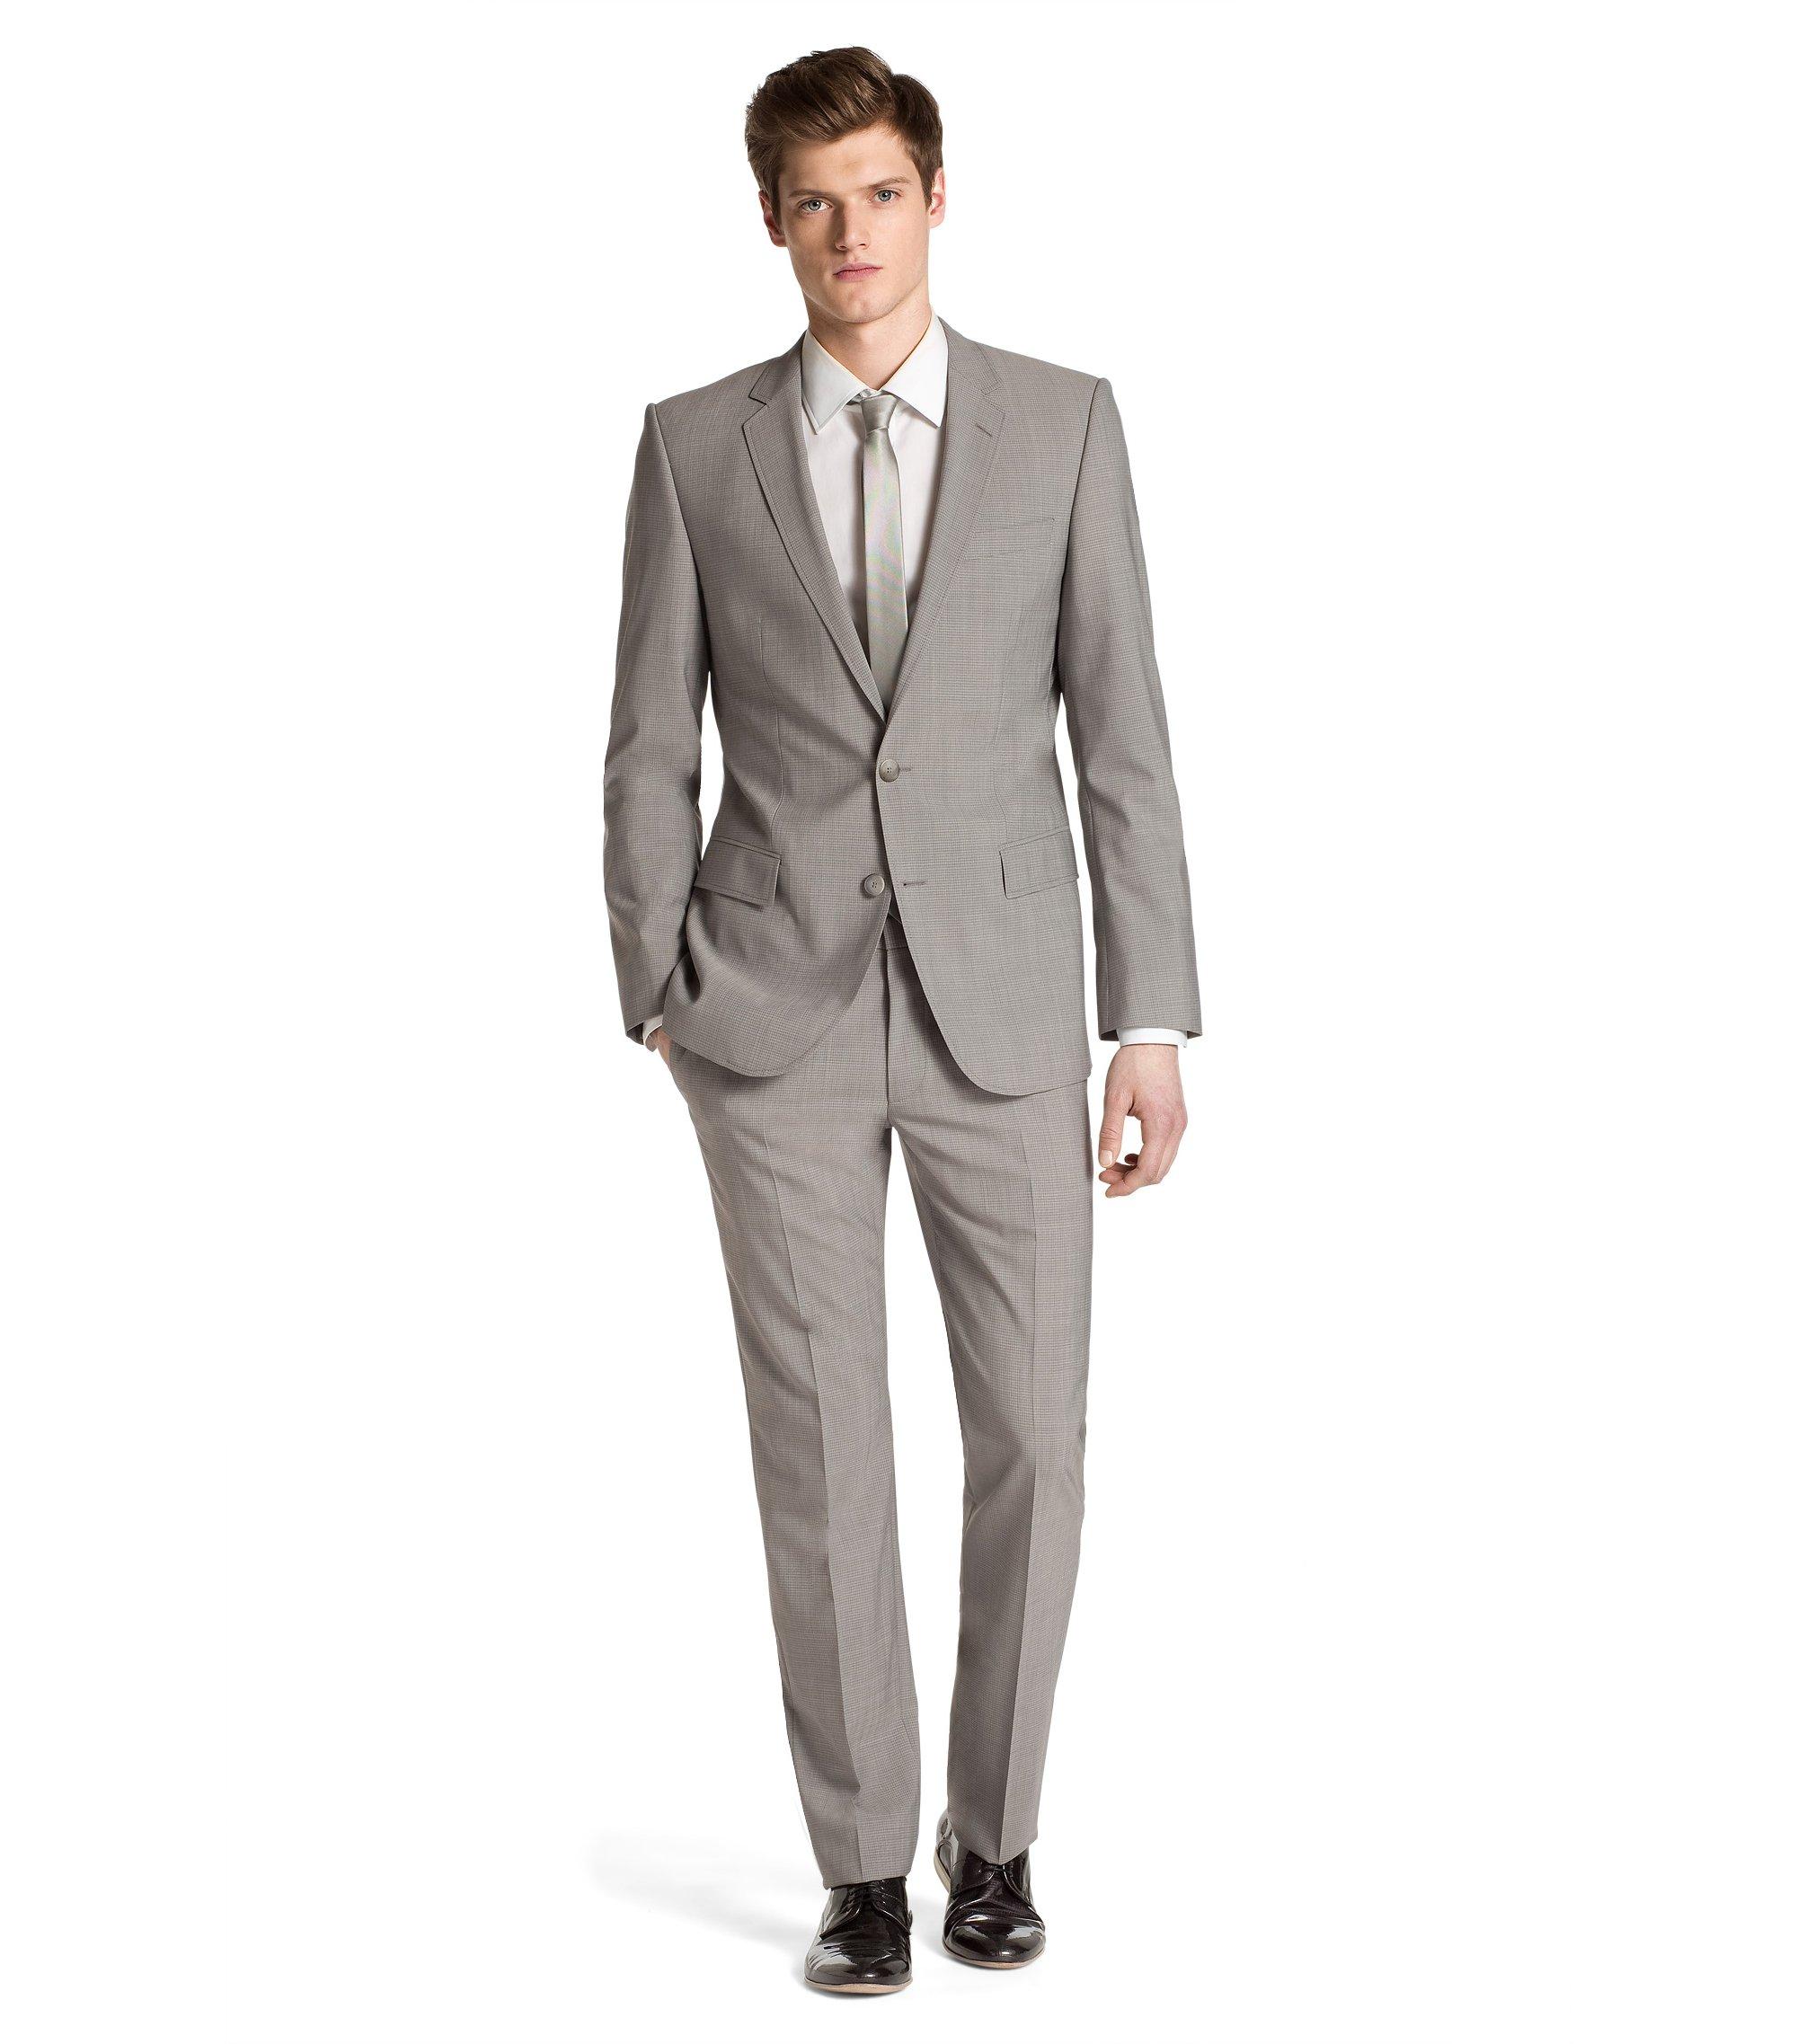 Slim-Fit Anzug ´Aiko1/Heise`, Grau